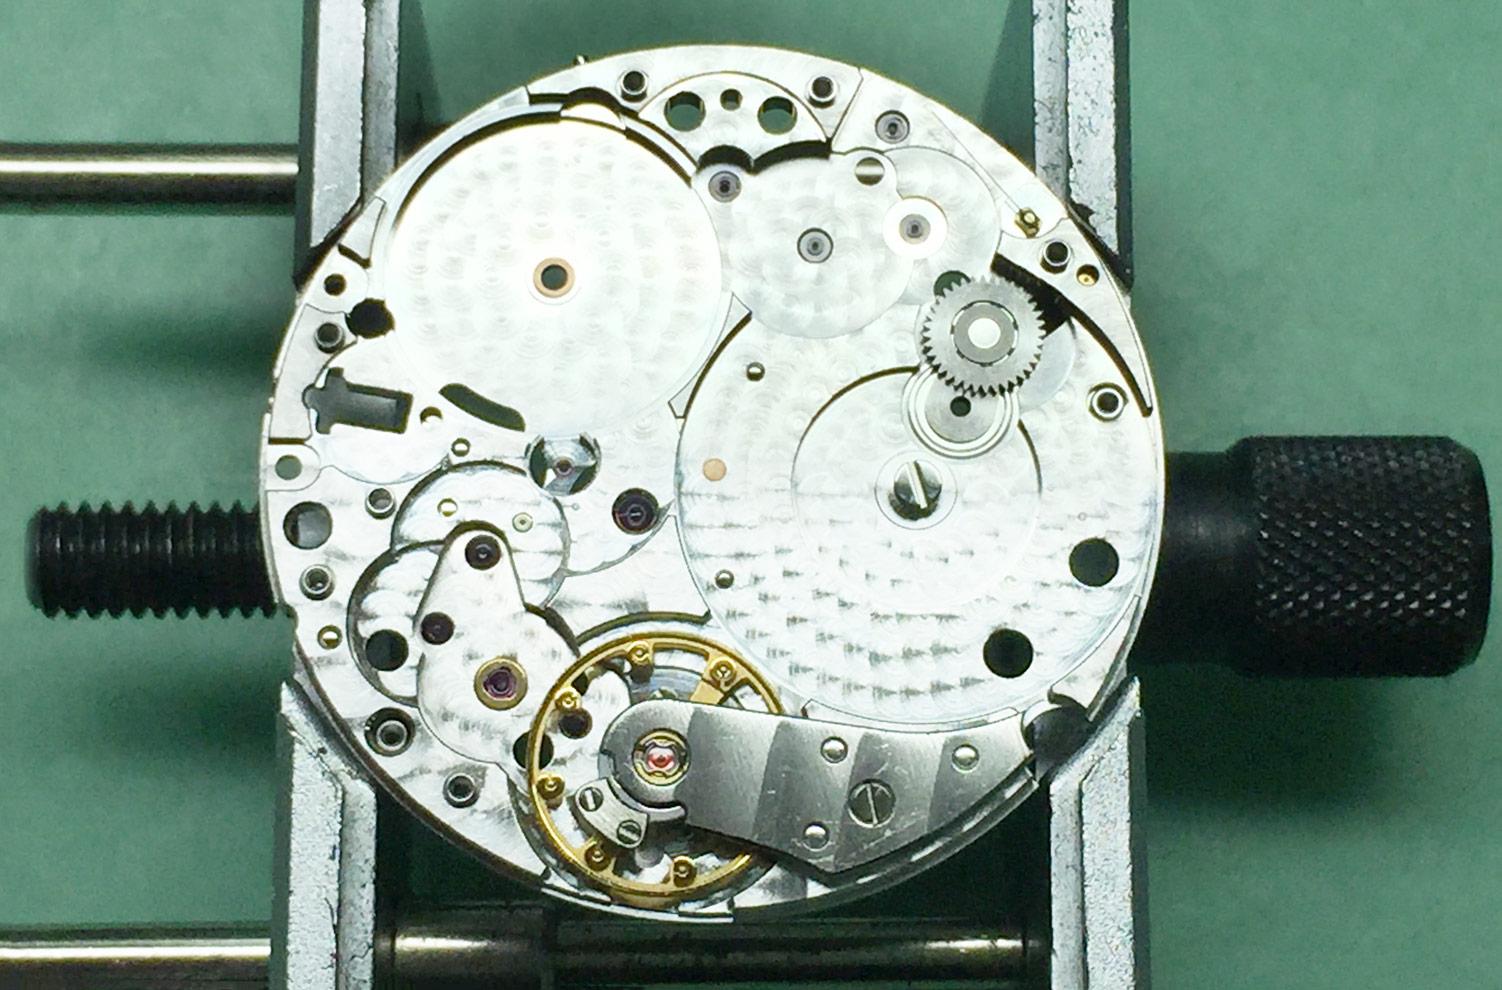 Patek Philippe Neptune Complications Watch Repair